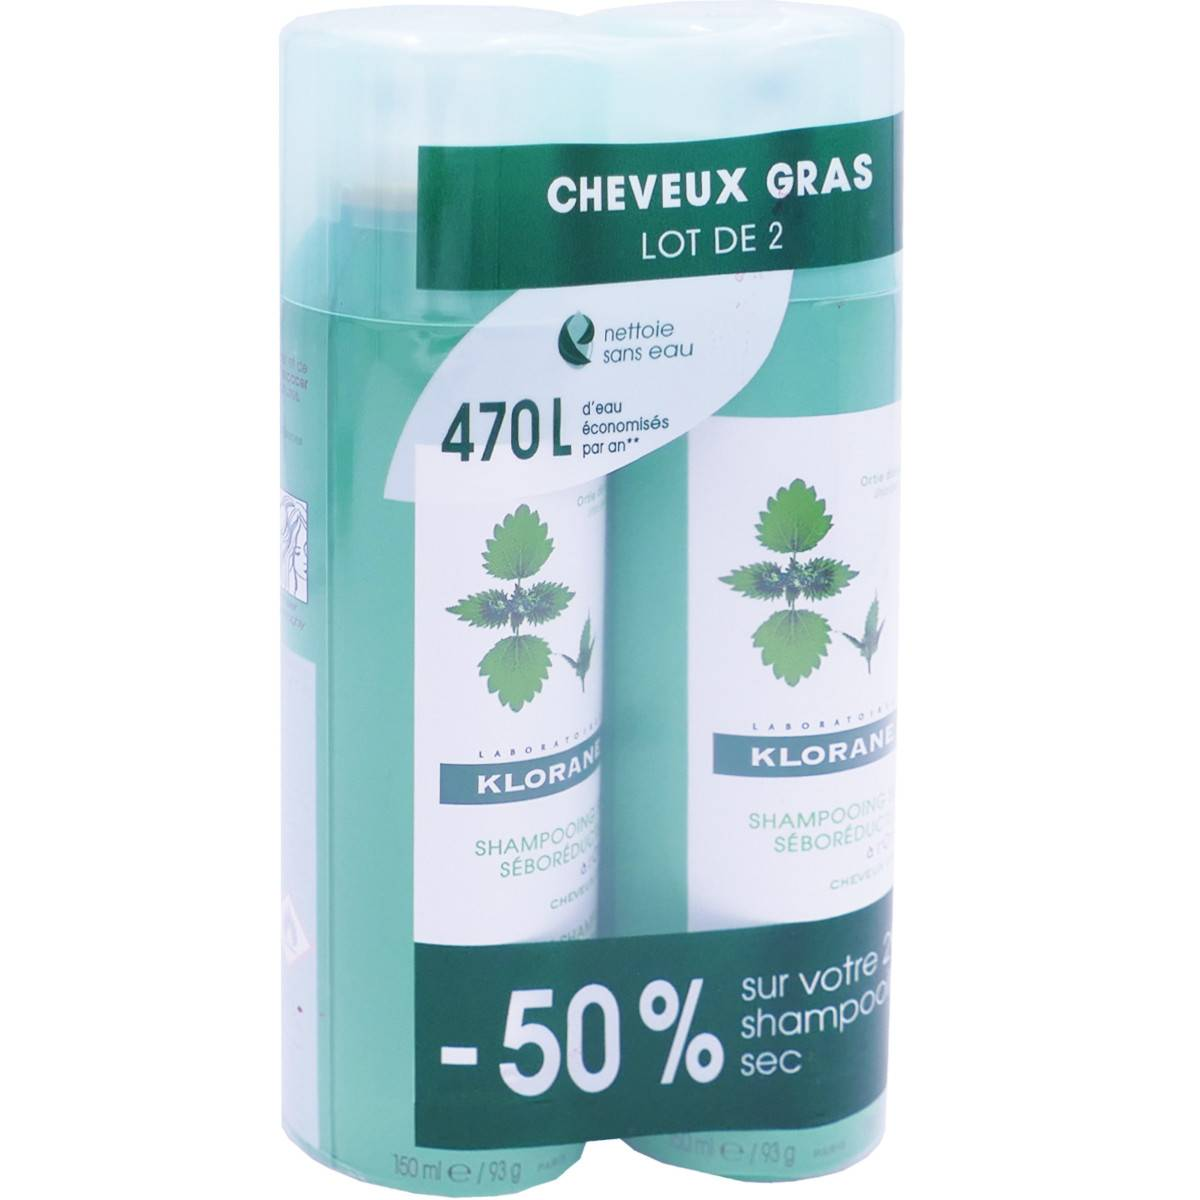 Klorane shampooing sec 2x 150 ml cheveux gras